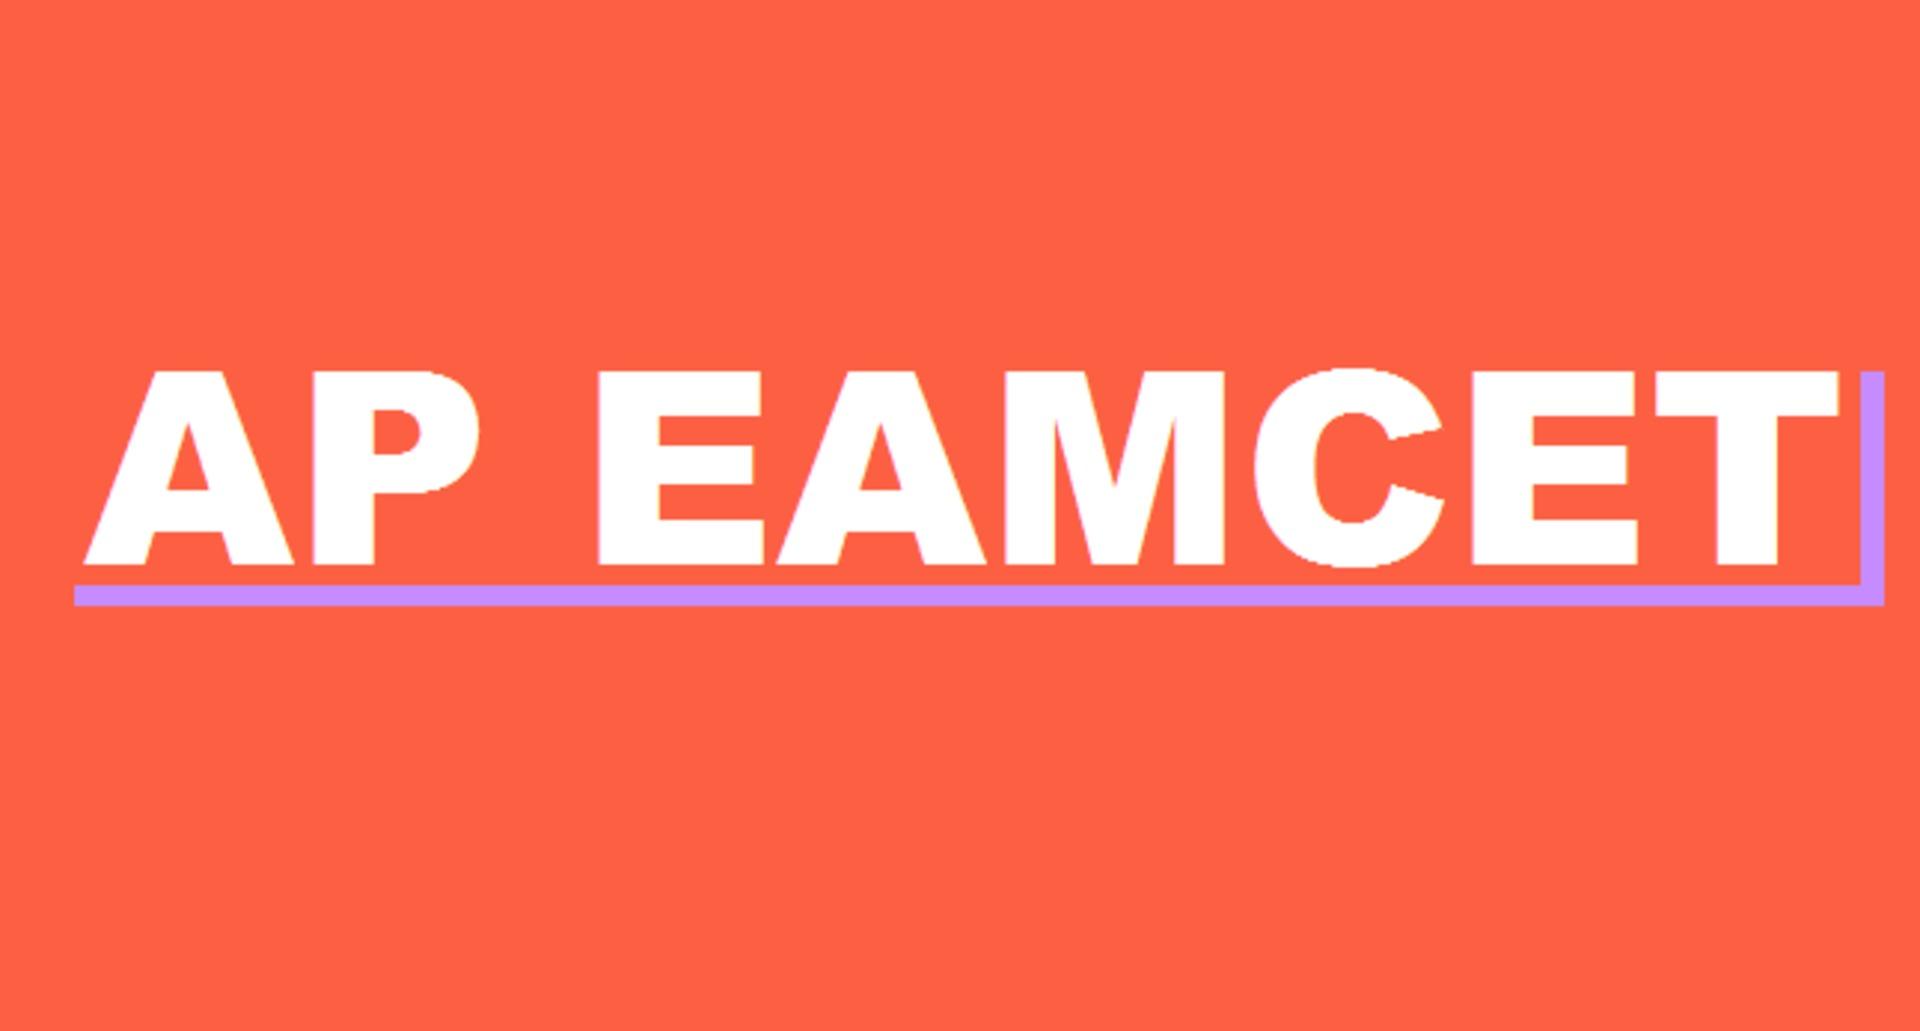 AP EAMCET 2019 image